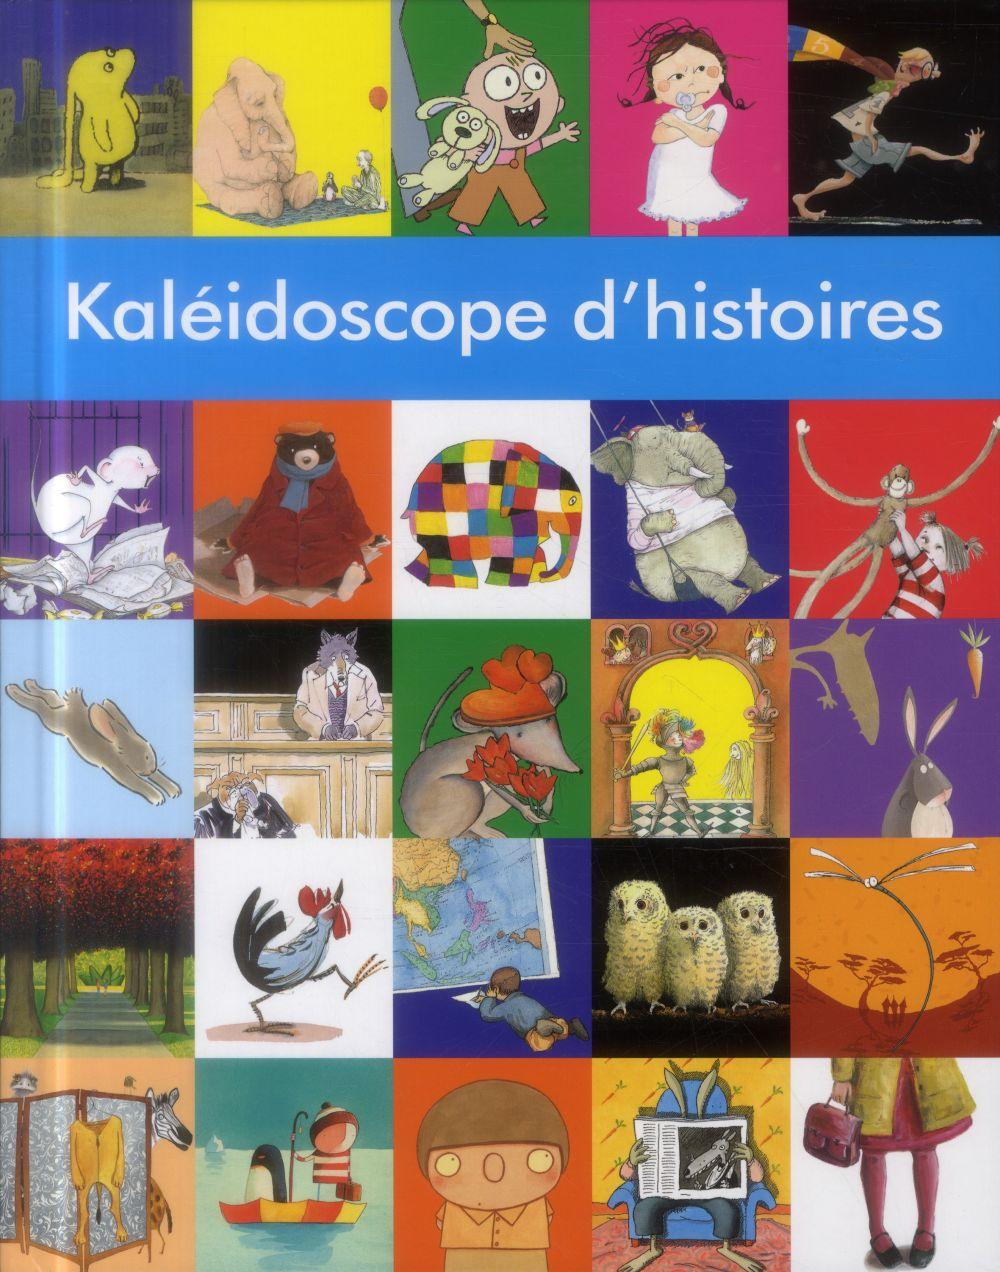 KALEIDOSCOPE D'HISTOIRES